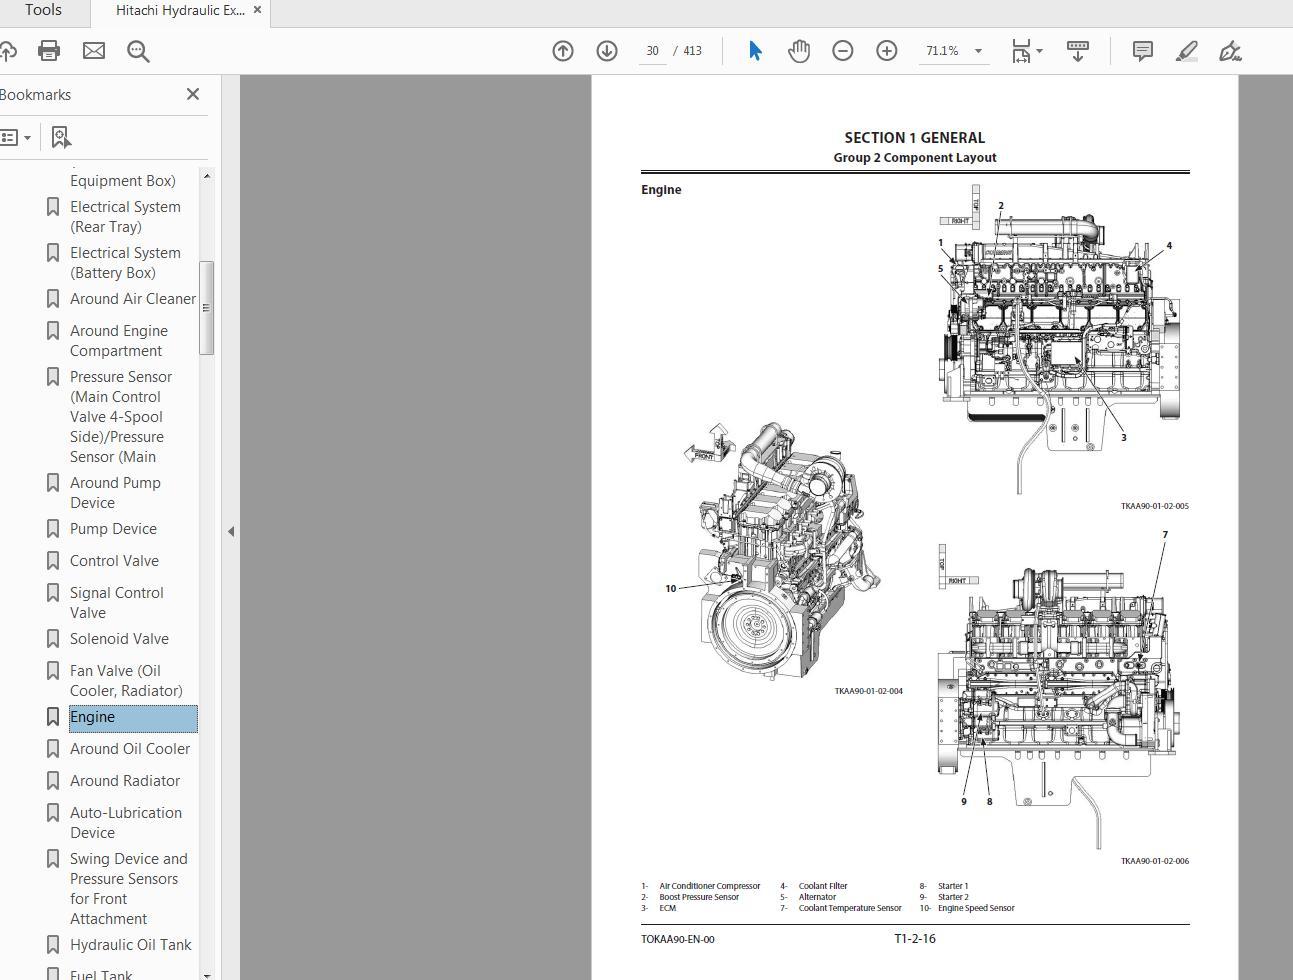 Hitachi Hydraulic Excavator Ex1200-7 Technical Manual Tokaa90-en-00 - Homepage